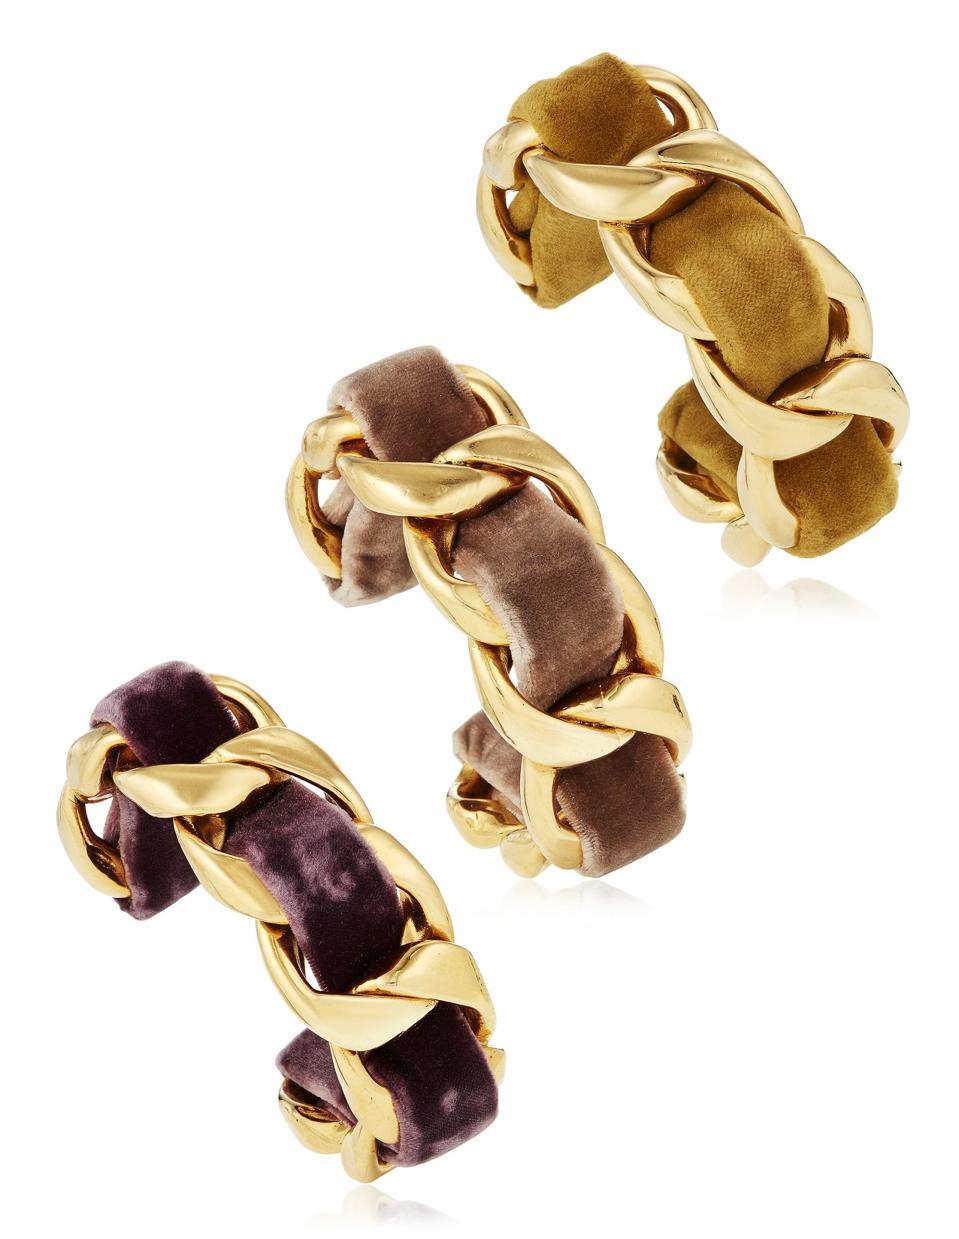 Unsigned chanel set of three velvet cuff bracelets, $1,000 - $1,500